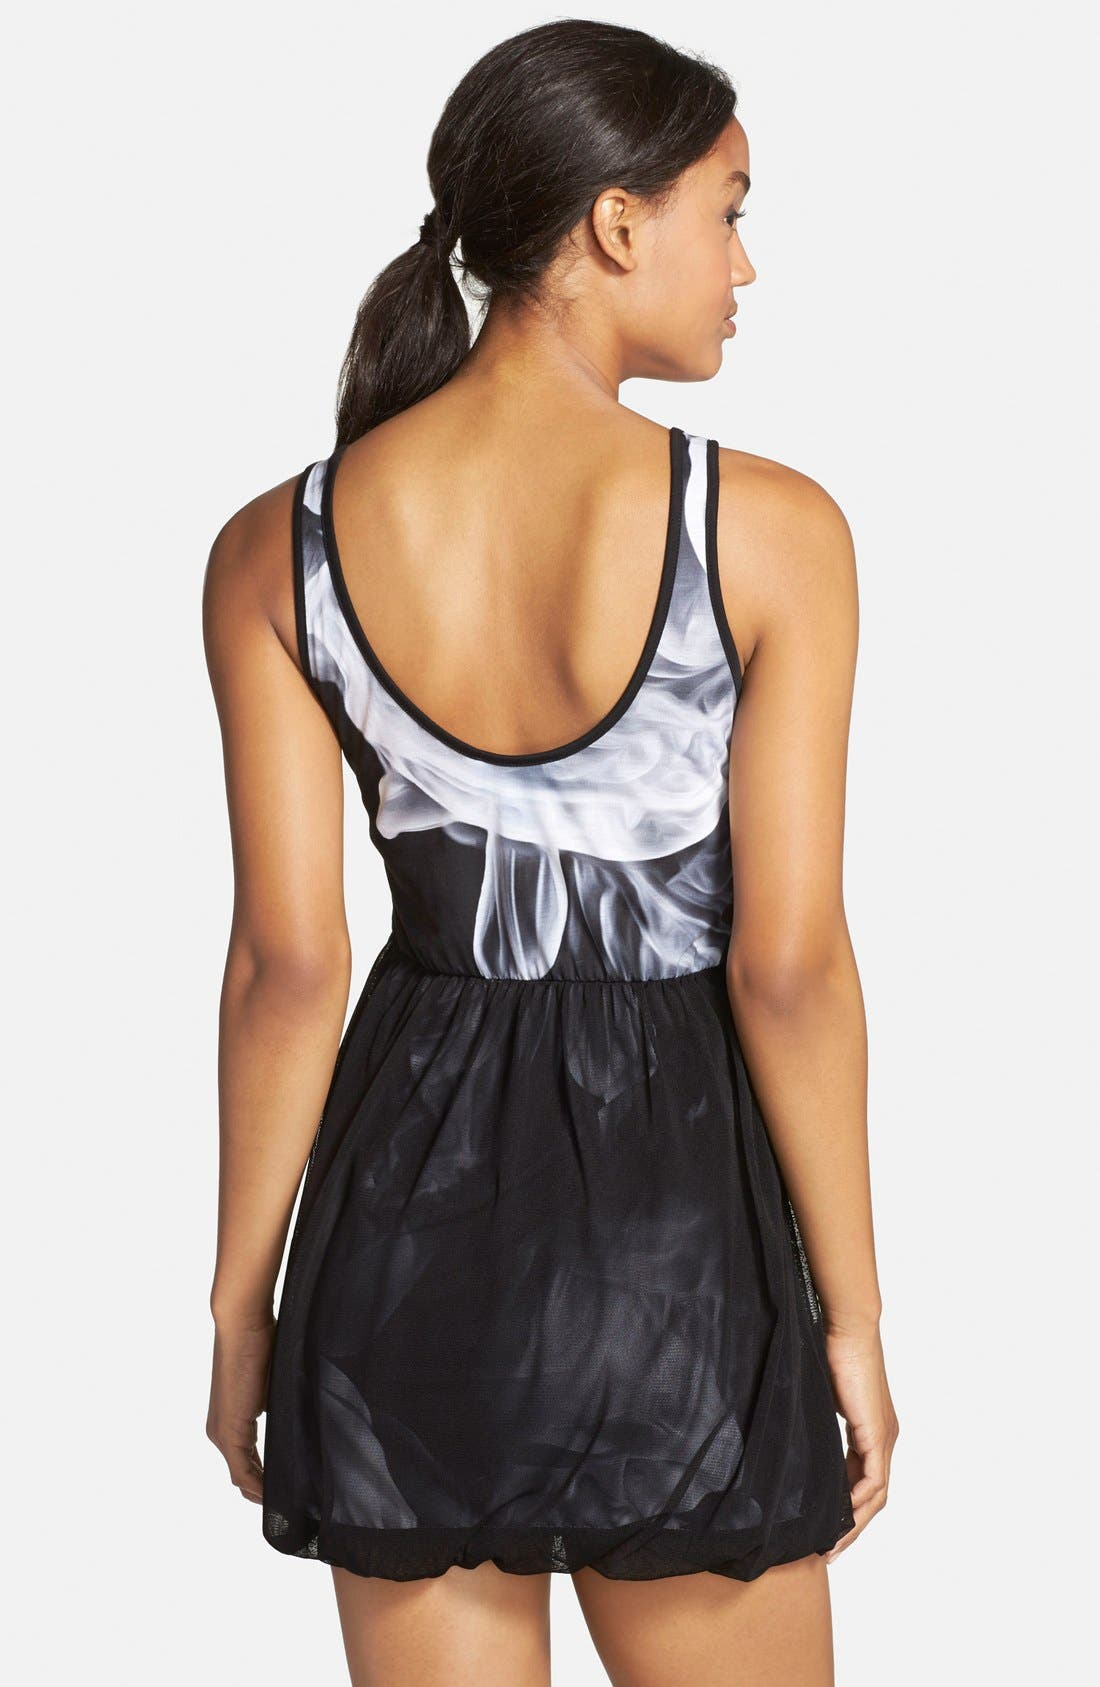 adidas 'White Smoke' Tank Dress,                             Alternate thumbnail 2, color,                             001